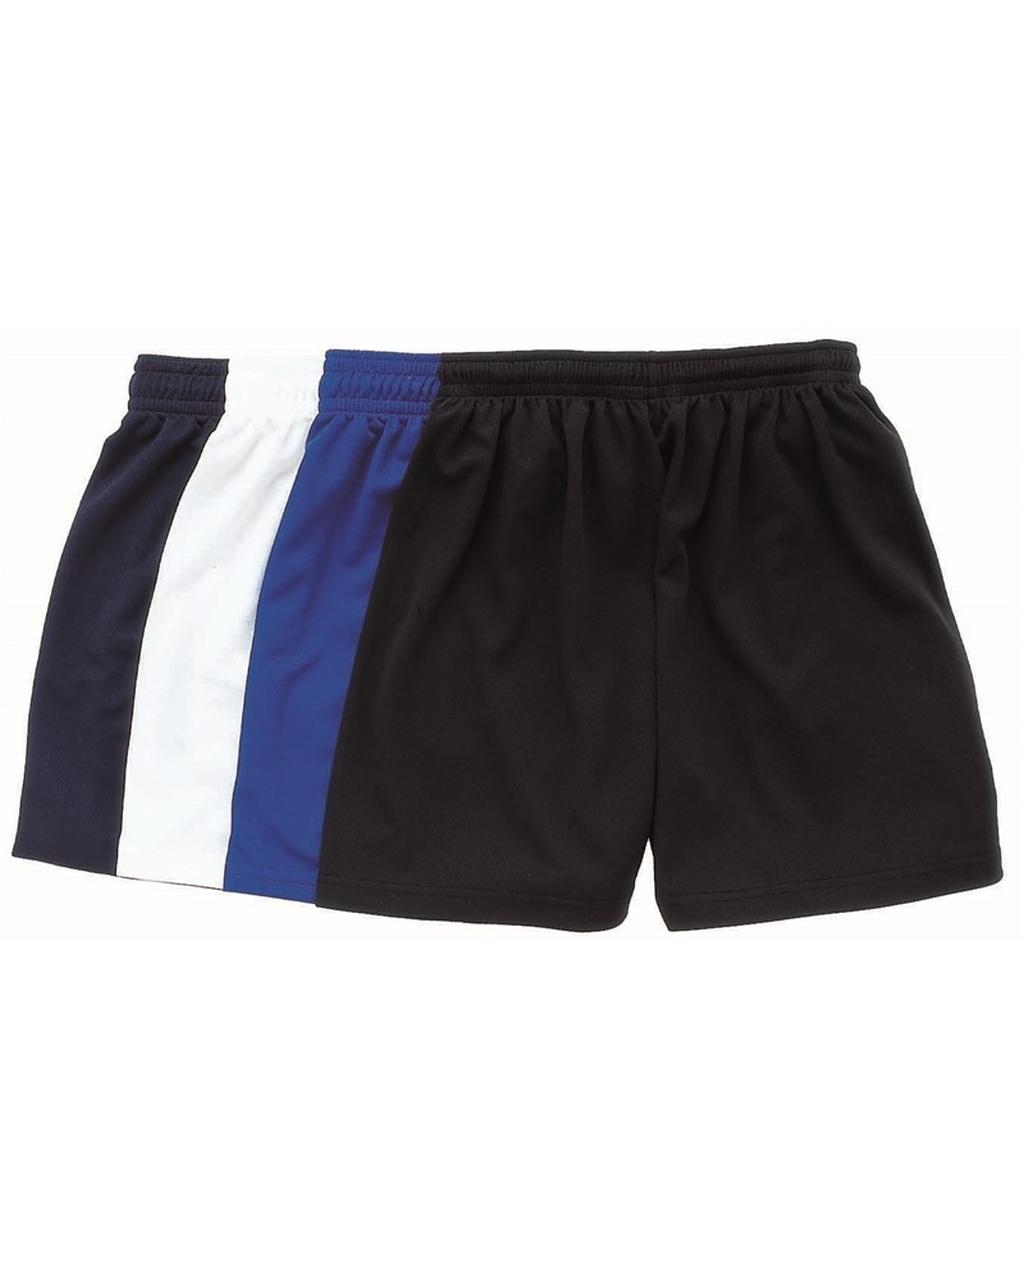 Football Shorts - 24/26